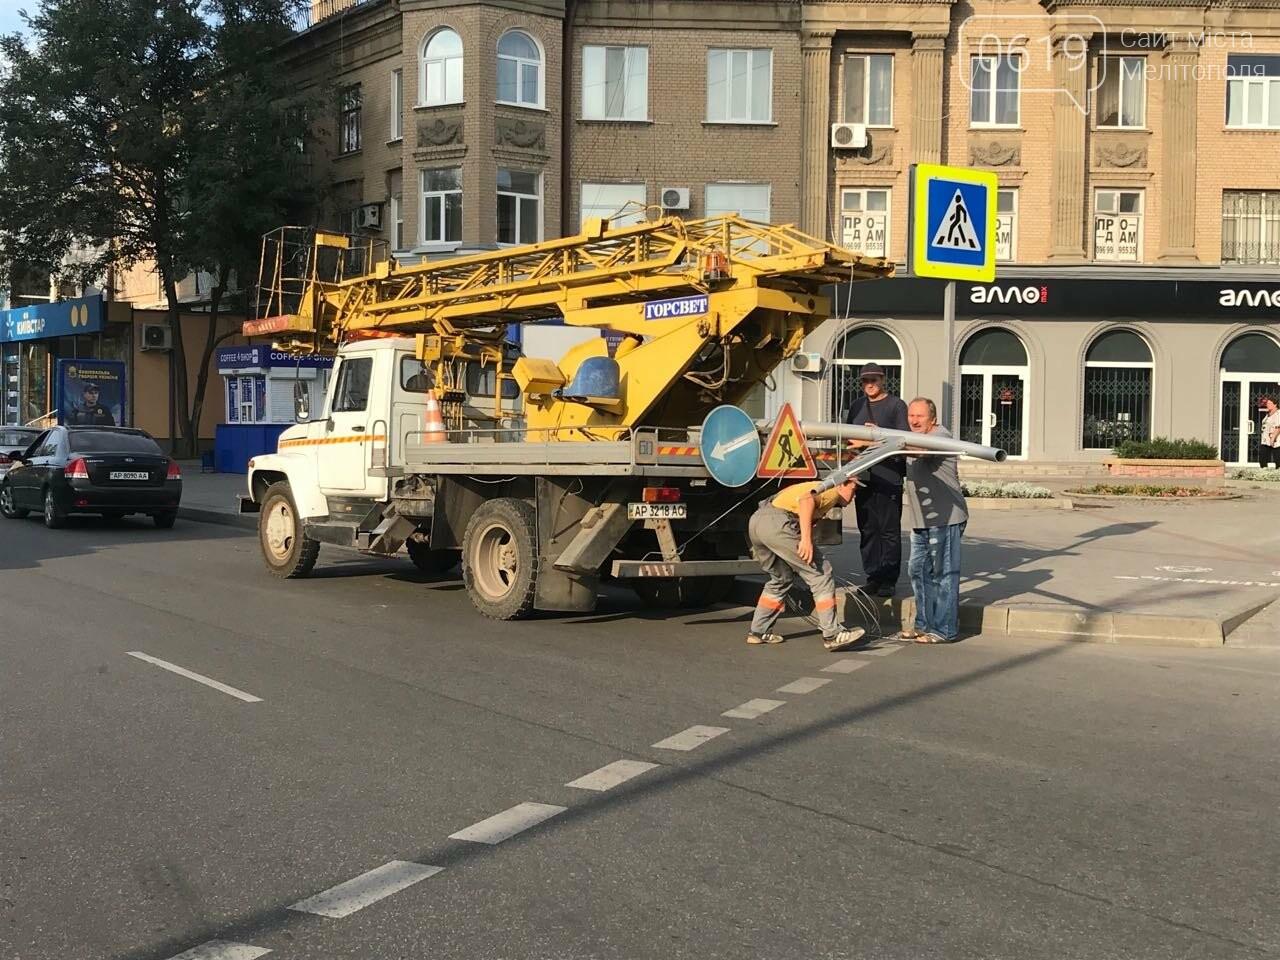 В центре Мелитополя водитель снес электроопору, - ФОТО, фото-3